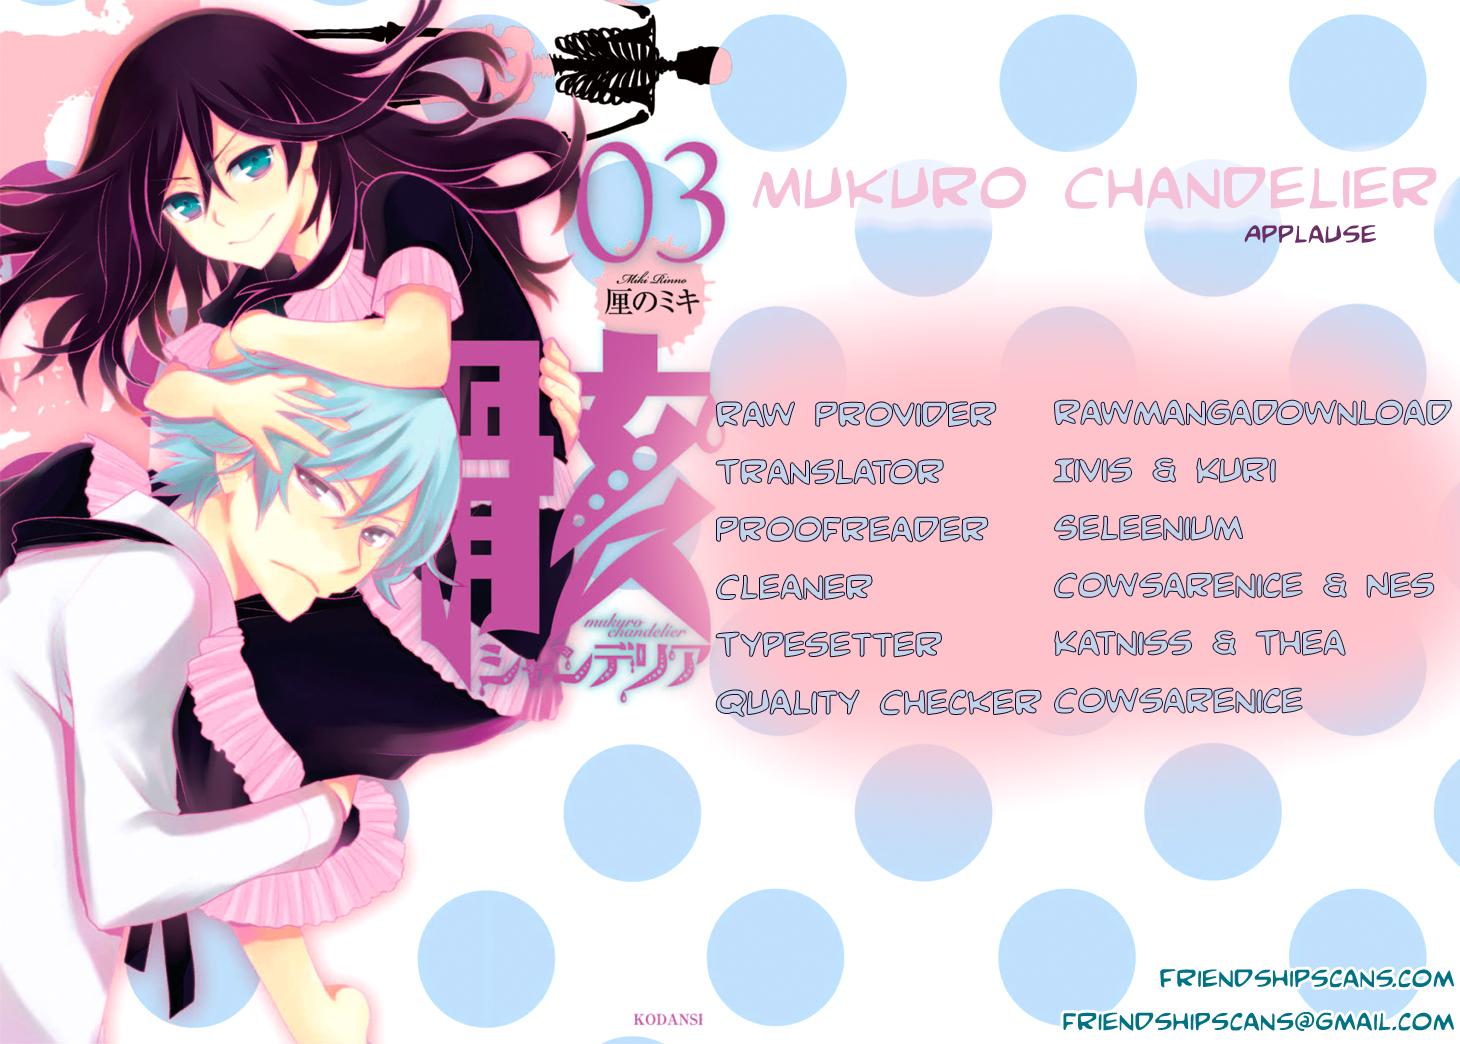 Mukuro Chandelier Chap 2 - Next Chap 3